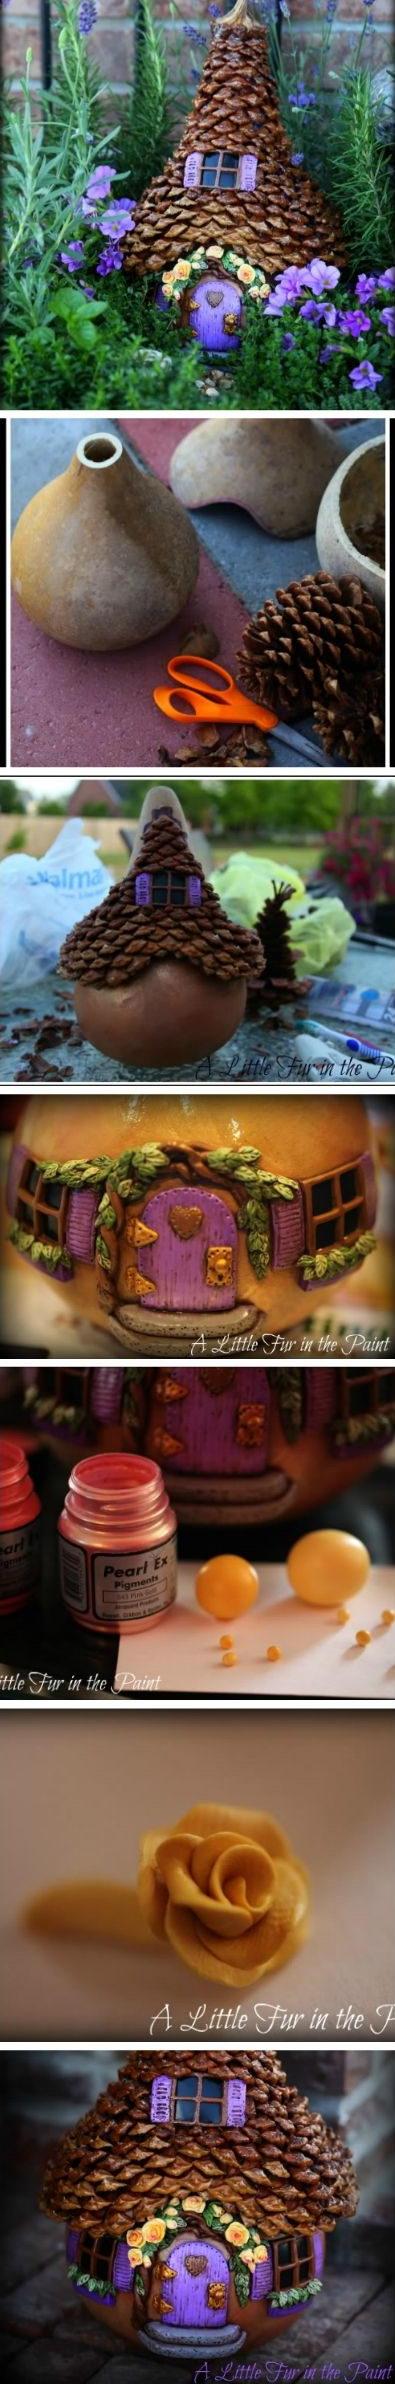 DIY Fairy House Using Pinecones.